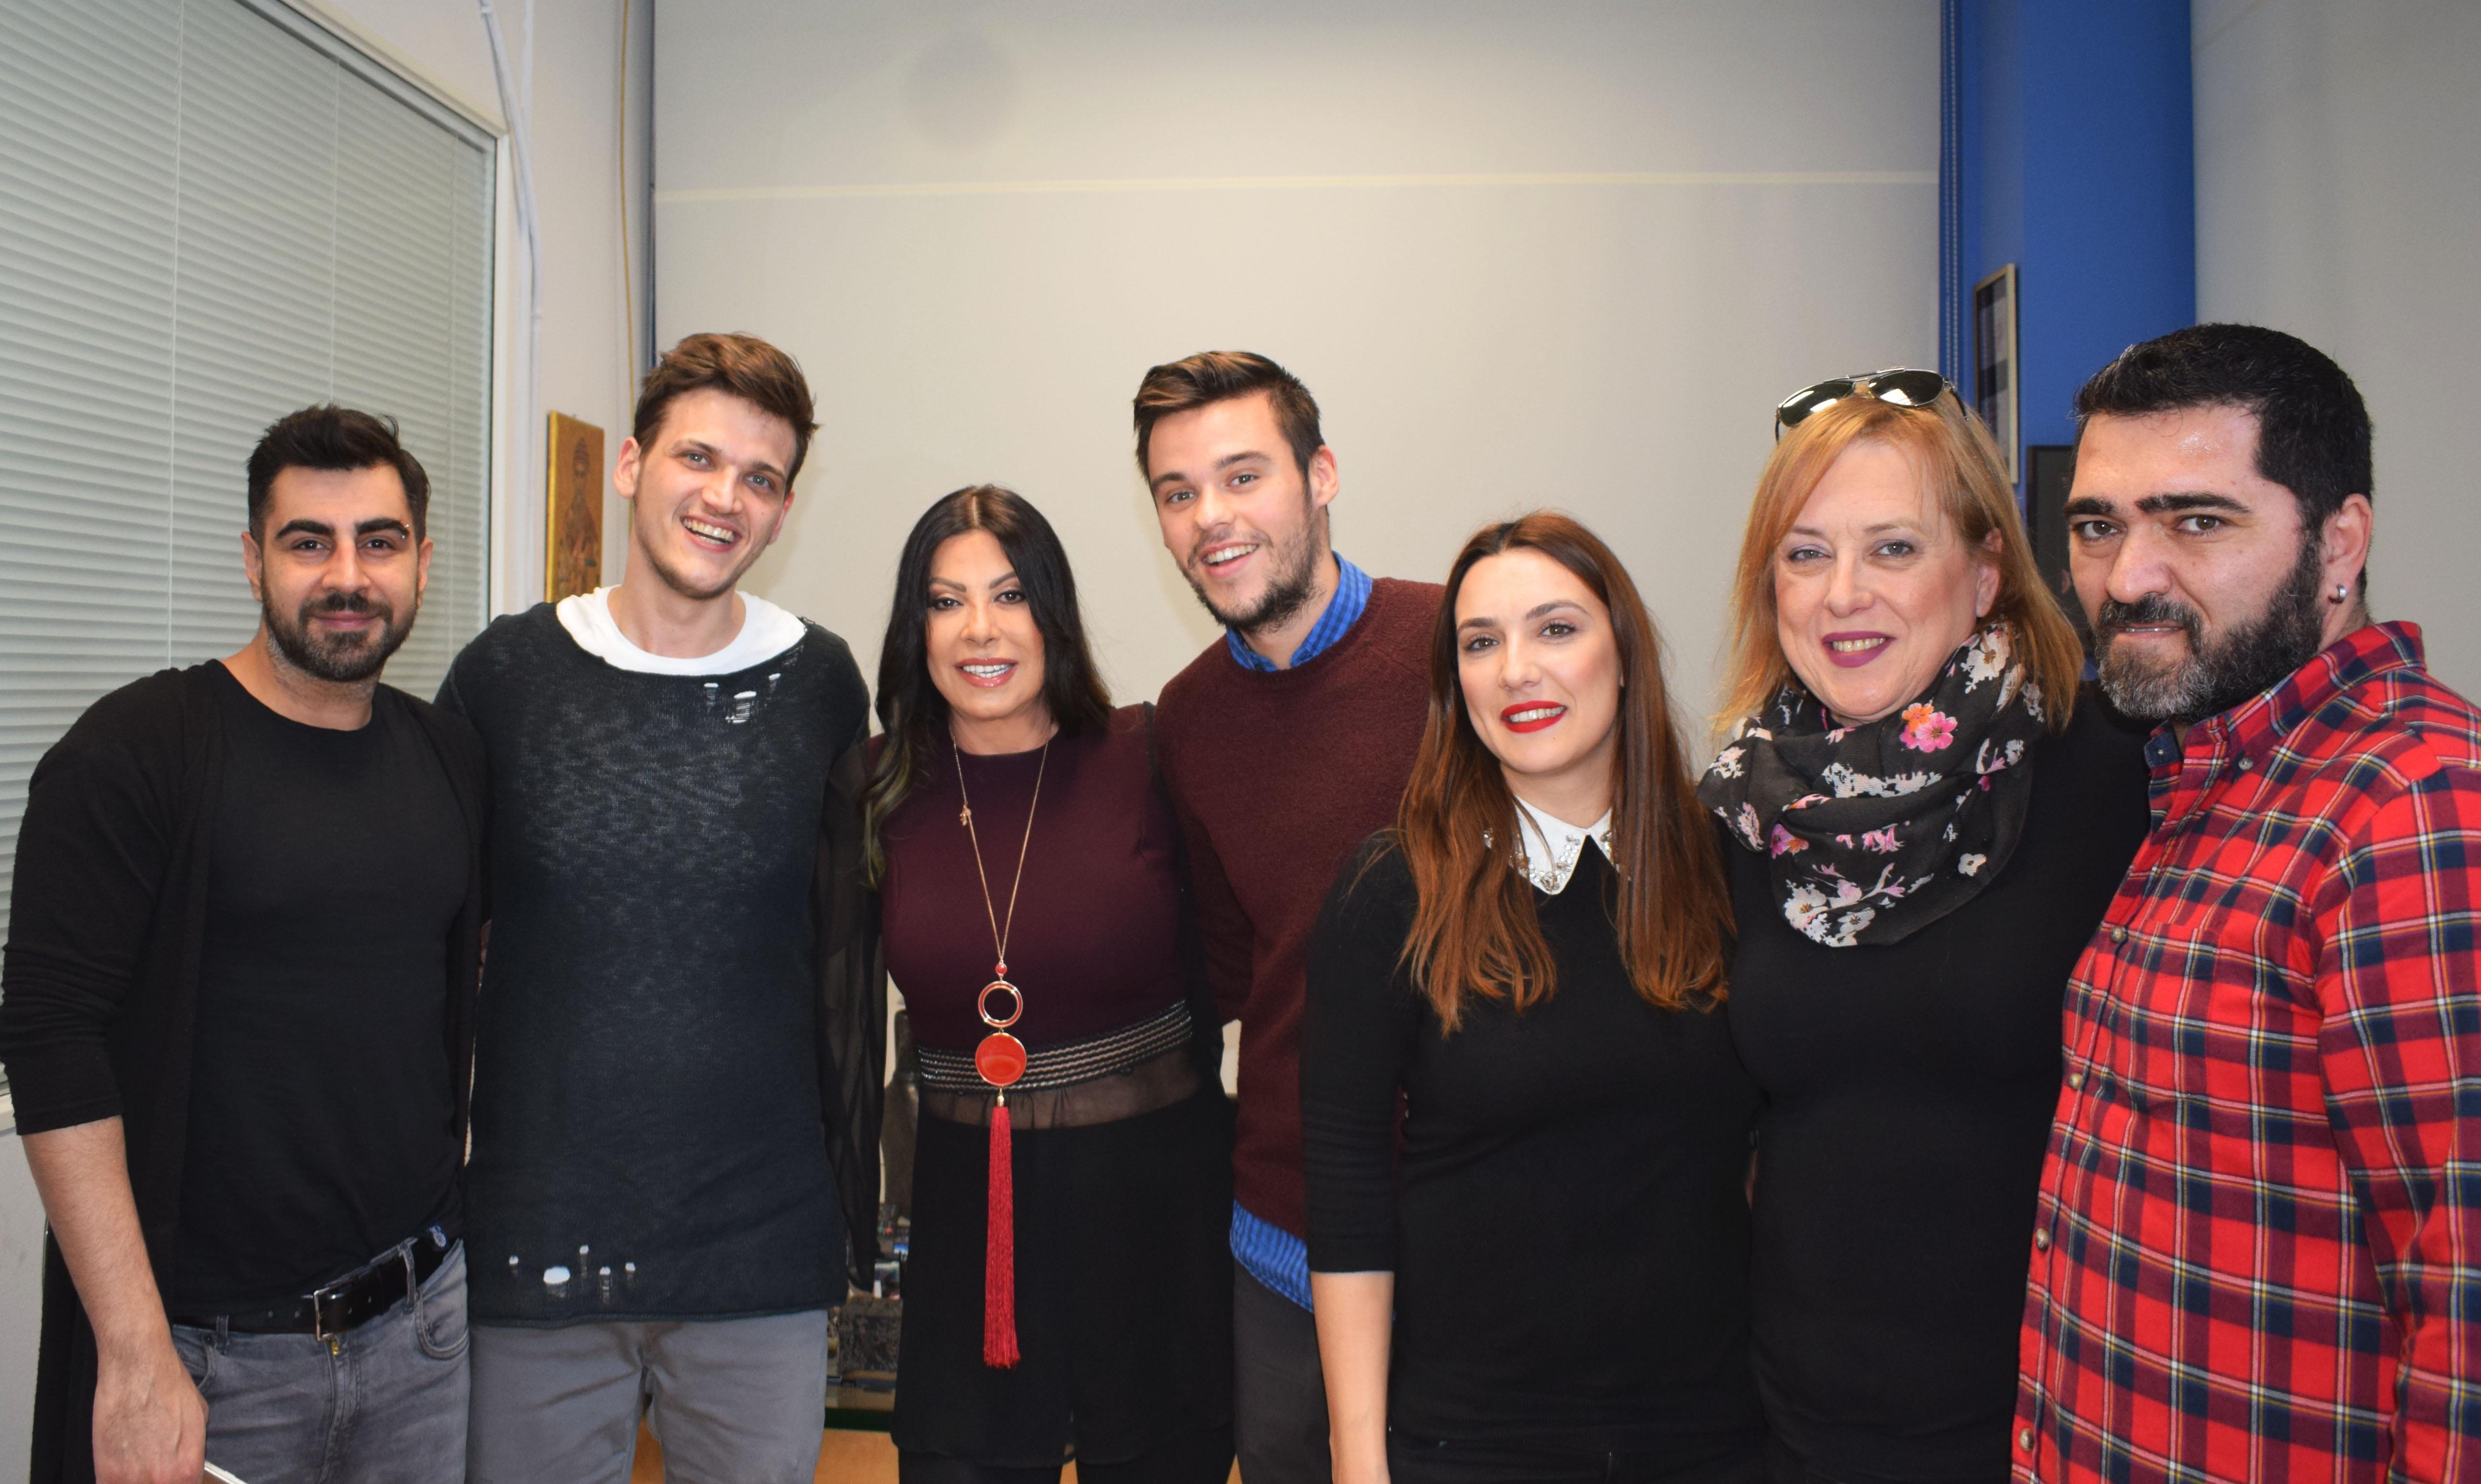 H Άντζελα Δημητρίου μόλις υπέγραψε με νέα δισκογραφική εταιρία! [pics] | tlife.gr